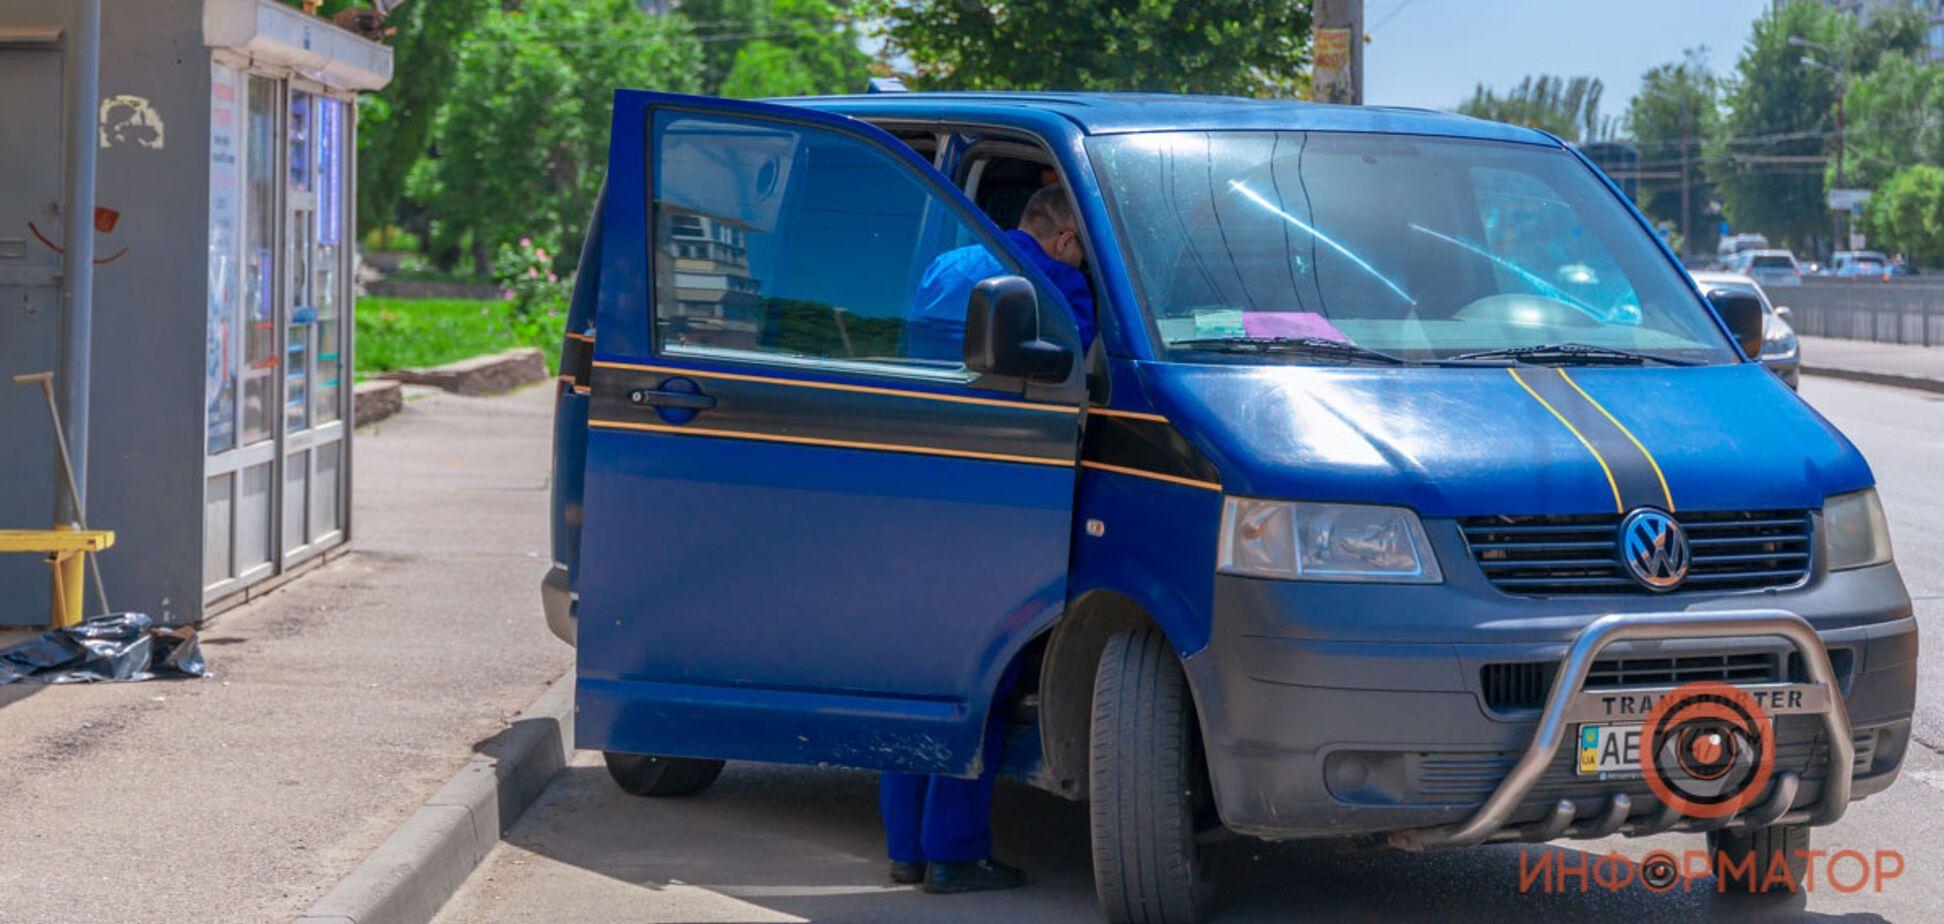 В Днепре мужчина умер прямо на троллейбусной остановке. Фото